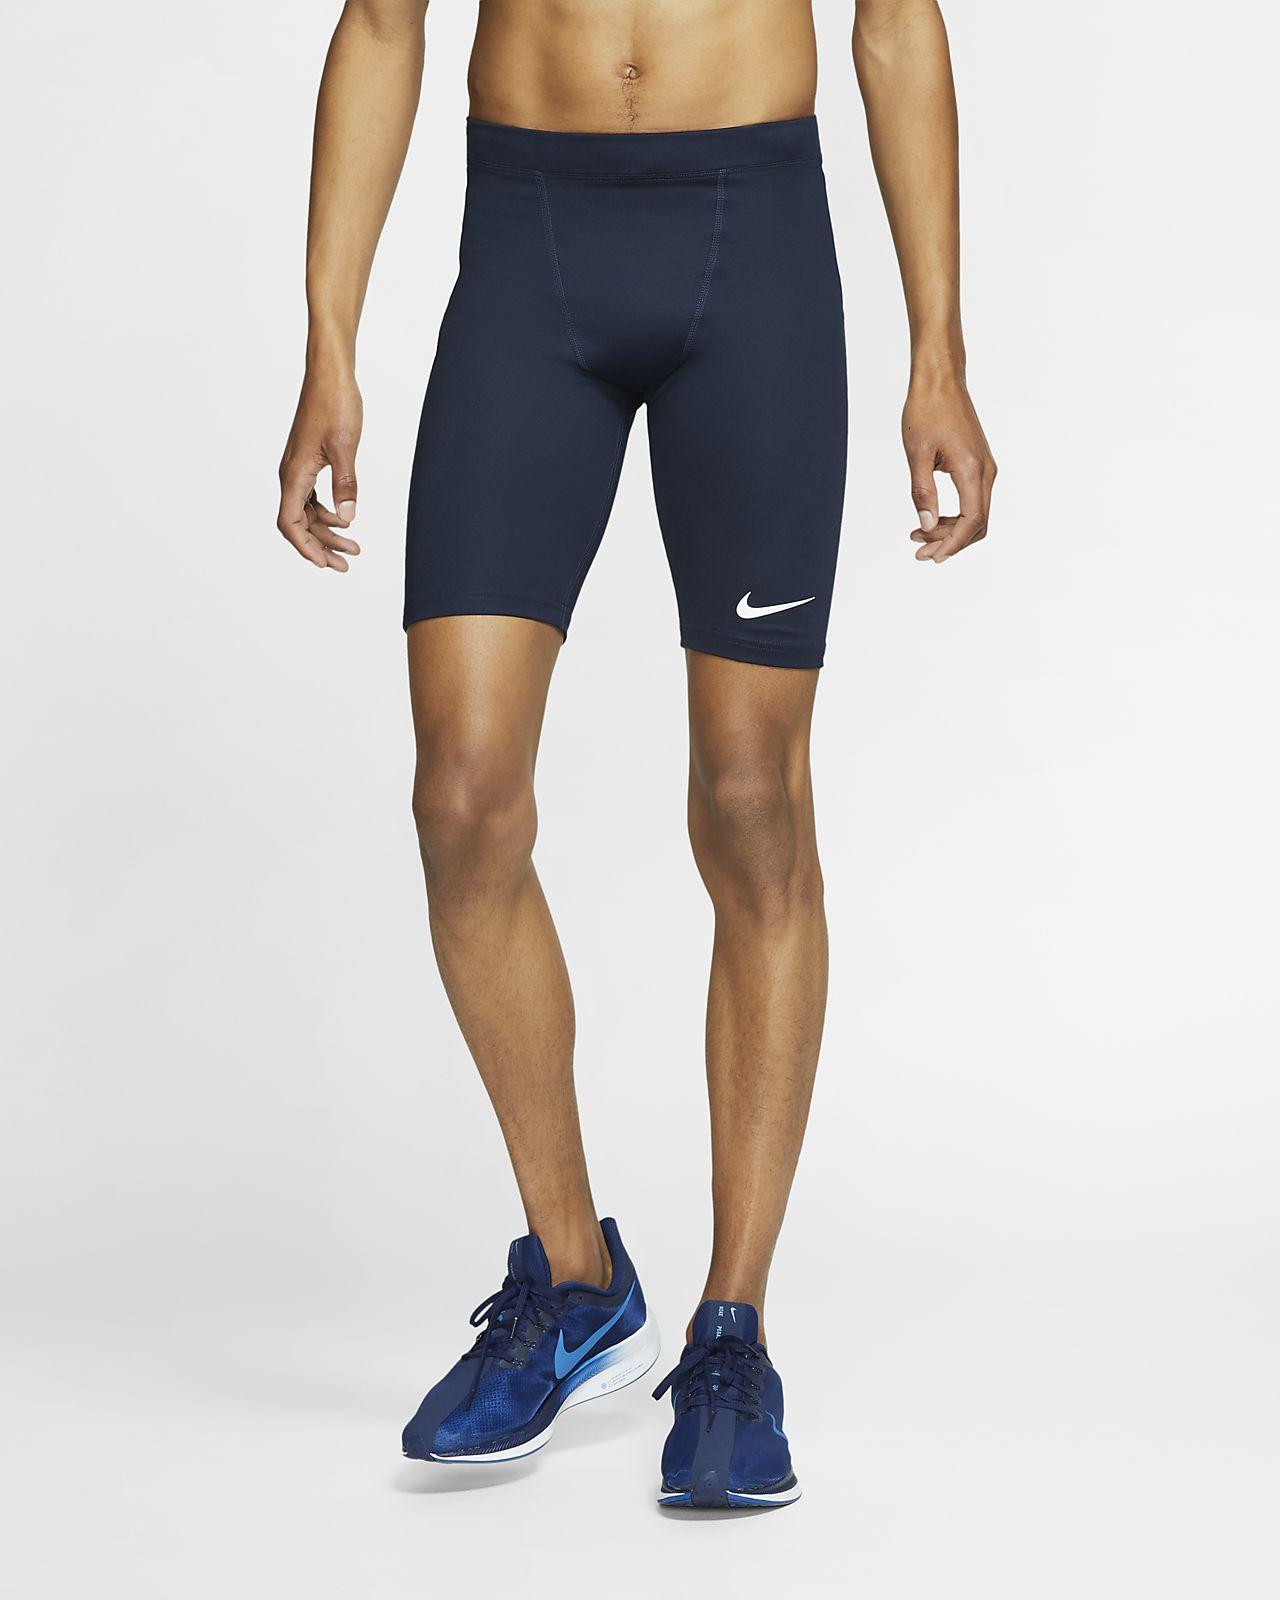 Nike Power Herren-Lauftights